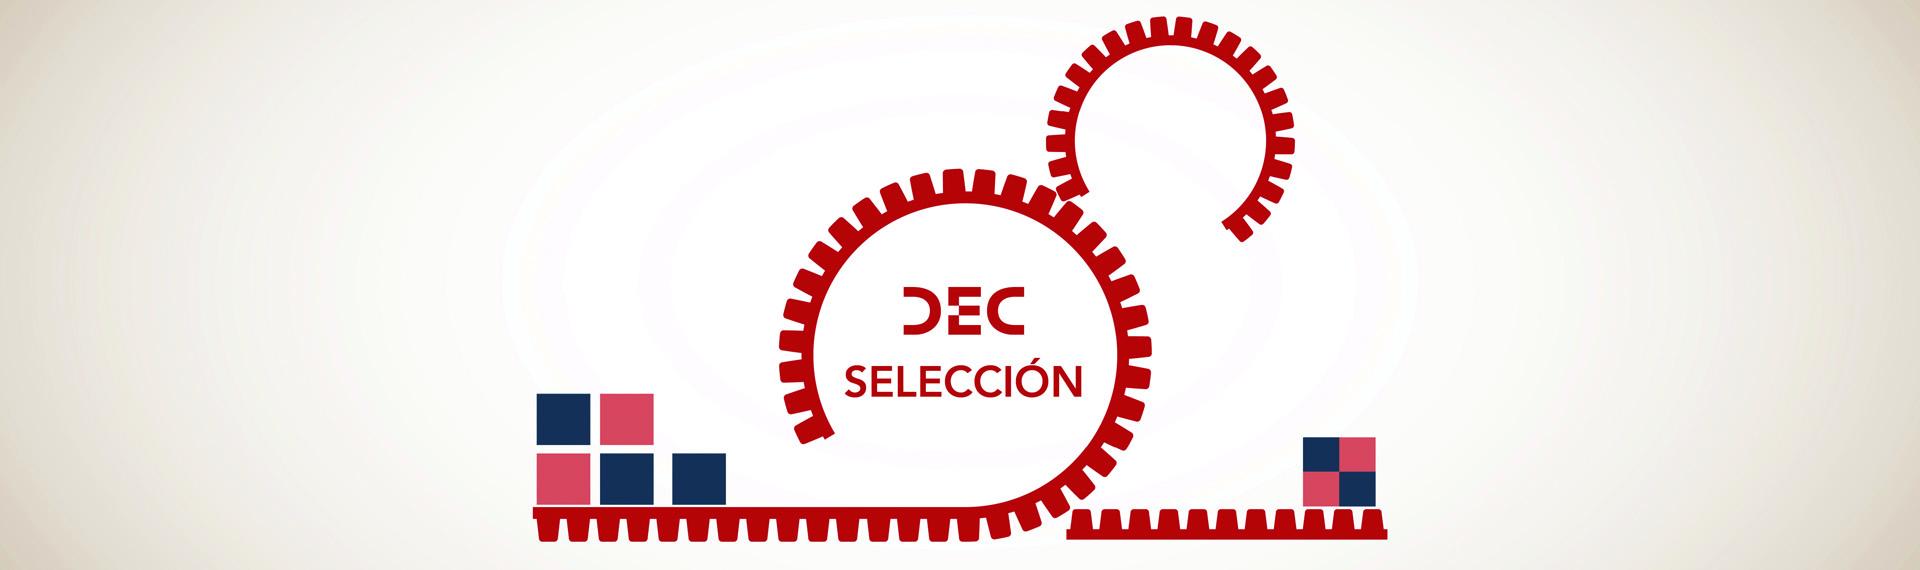 Primera edición DEC Selección - Evento